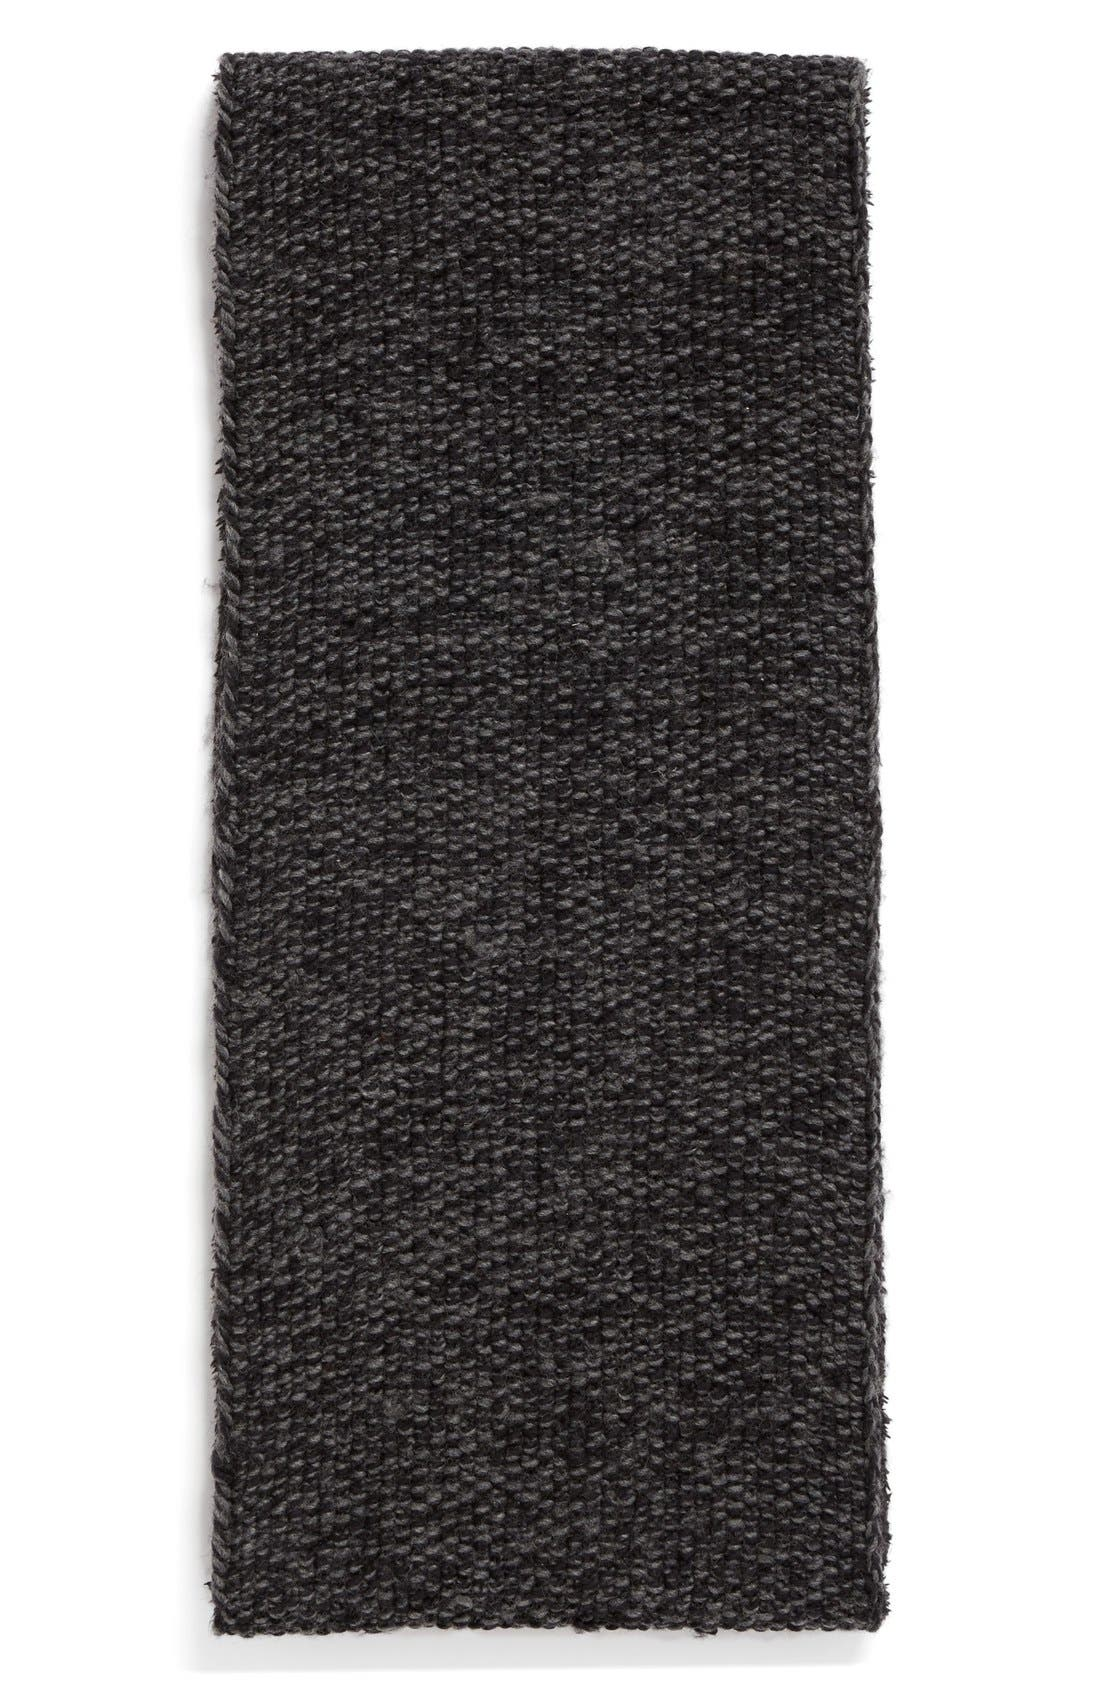 Alternate Image 2  - Nirvanna Designs Knit Wool Infinity Scarf